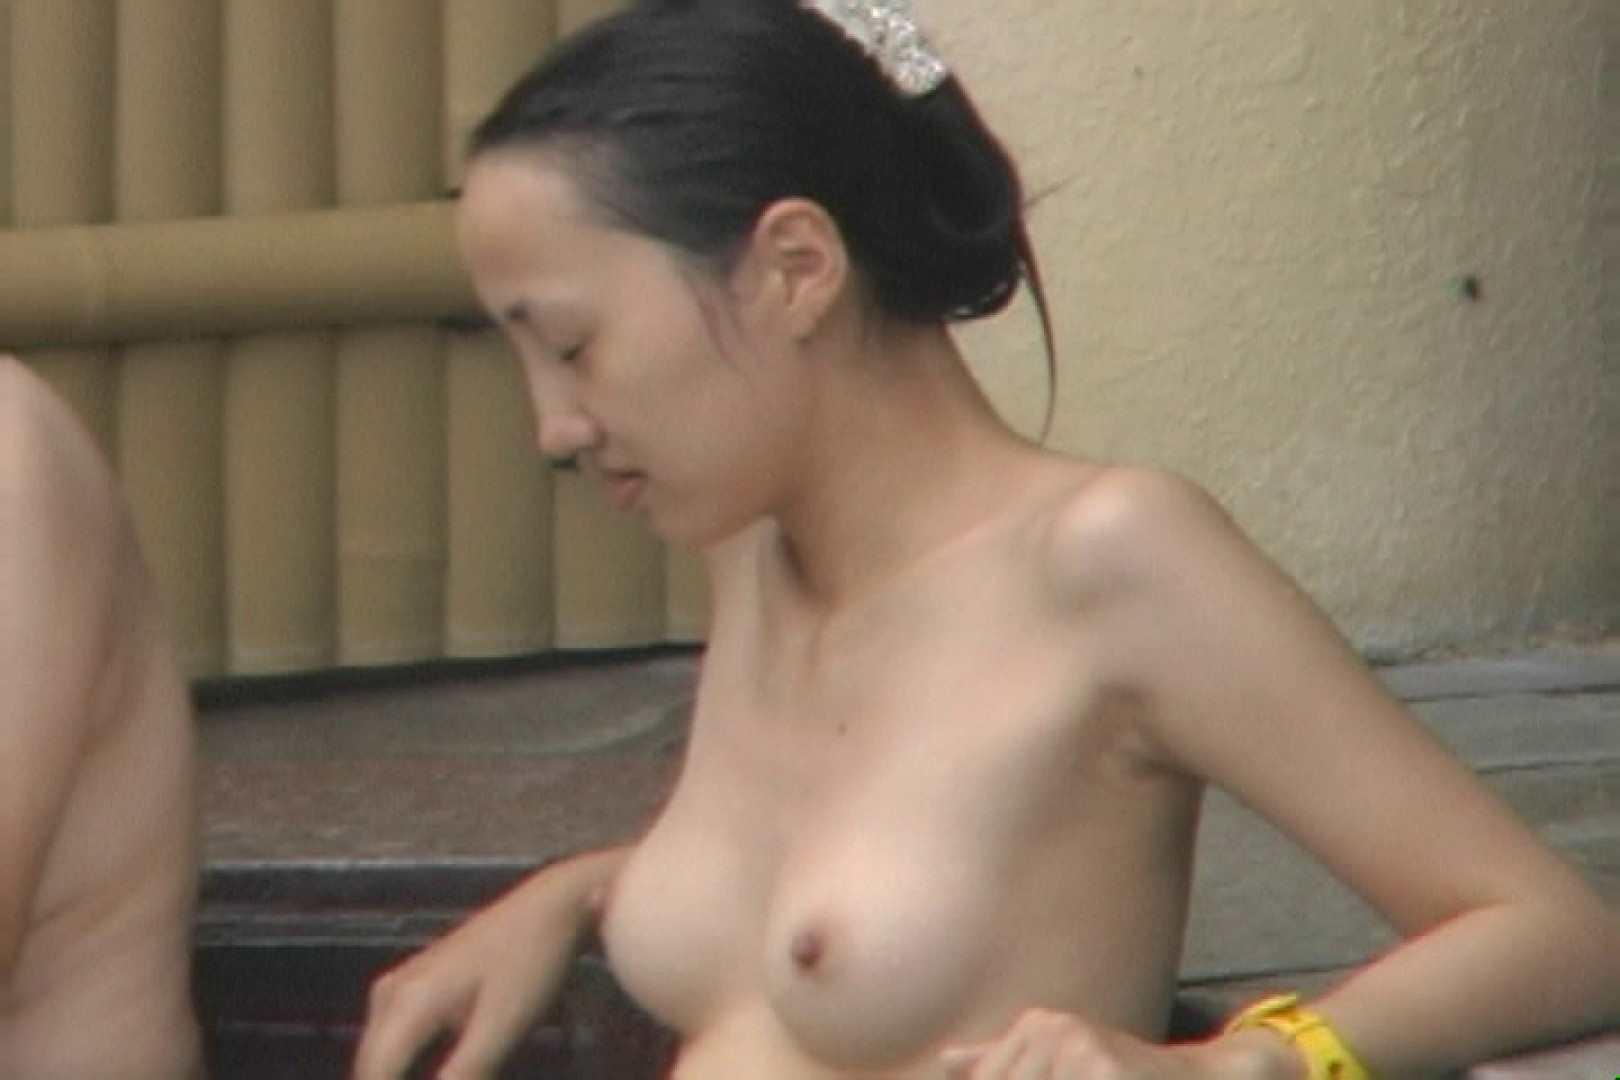 Aquaな露天風呂Vol.41 露天風呂突入 ヌード画像 107pic 65